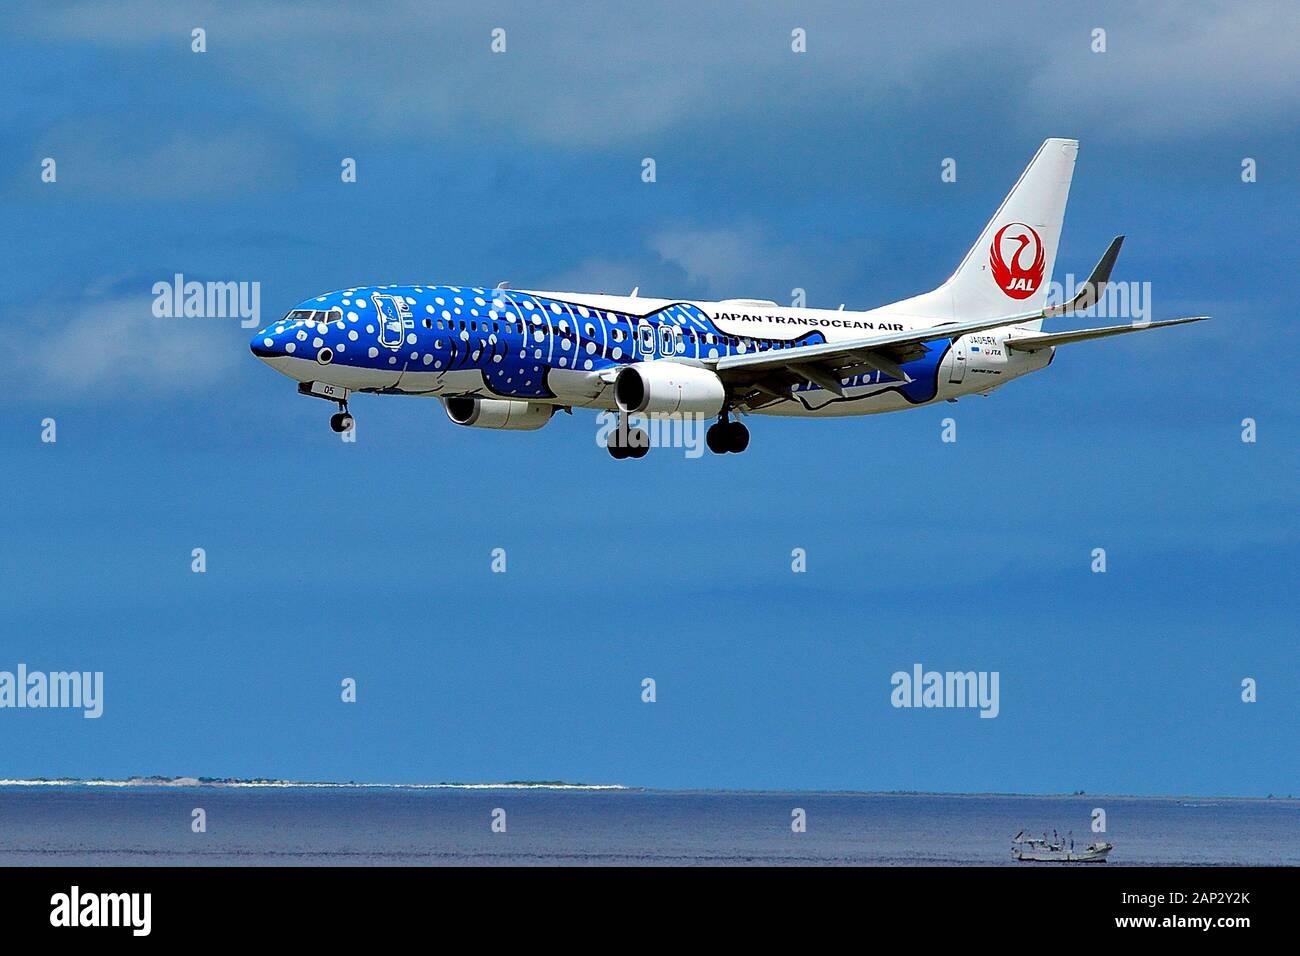 JTA, Boeing,B-737/800, JA05RK, Blue Whale Shark, Landing, Naha Airport, Naha, Okinawa, Ryukyu Islands, Japan Stock Photo